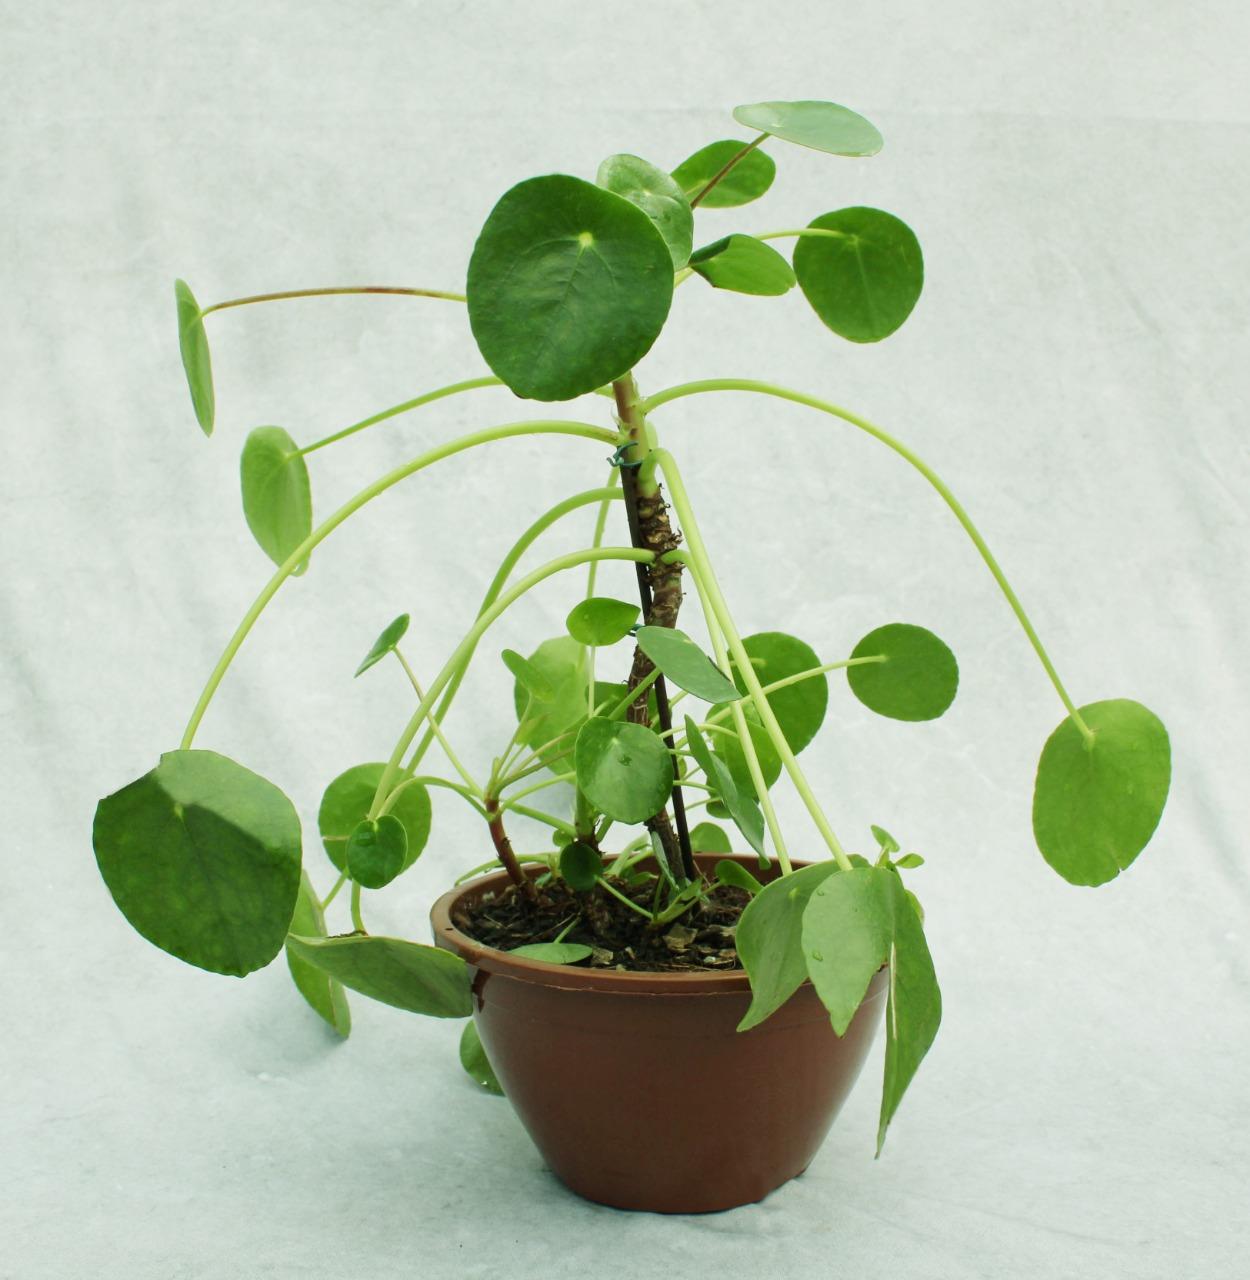 Planta da amizade - Cuia 18 (Pilea peperomioides)